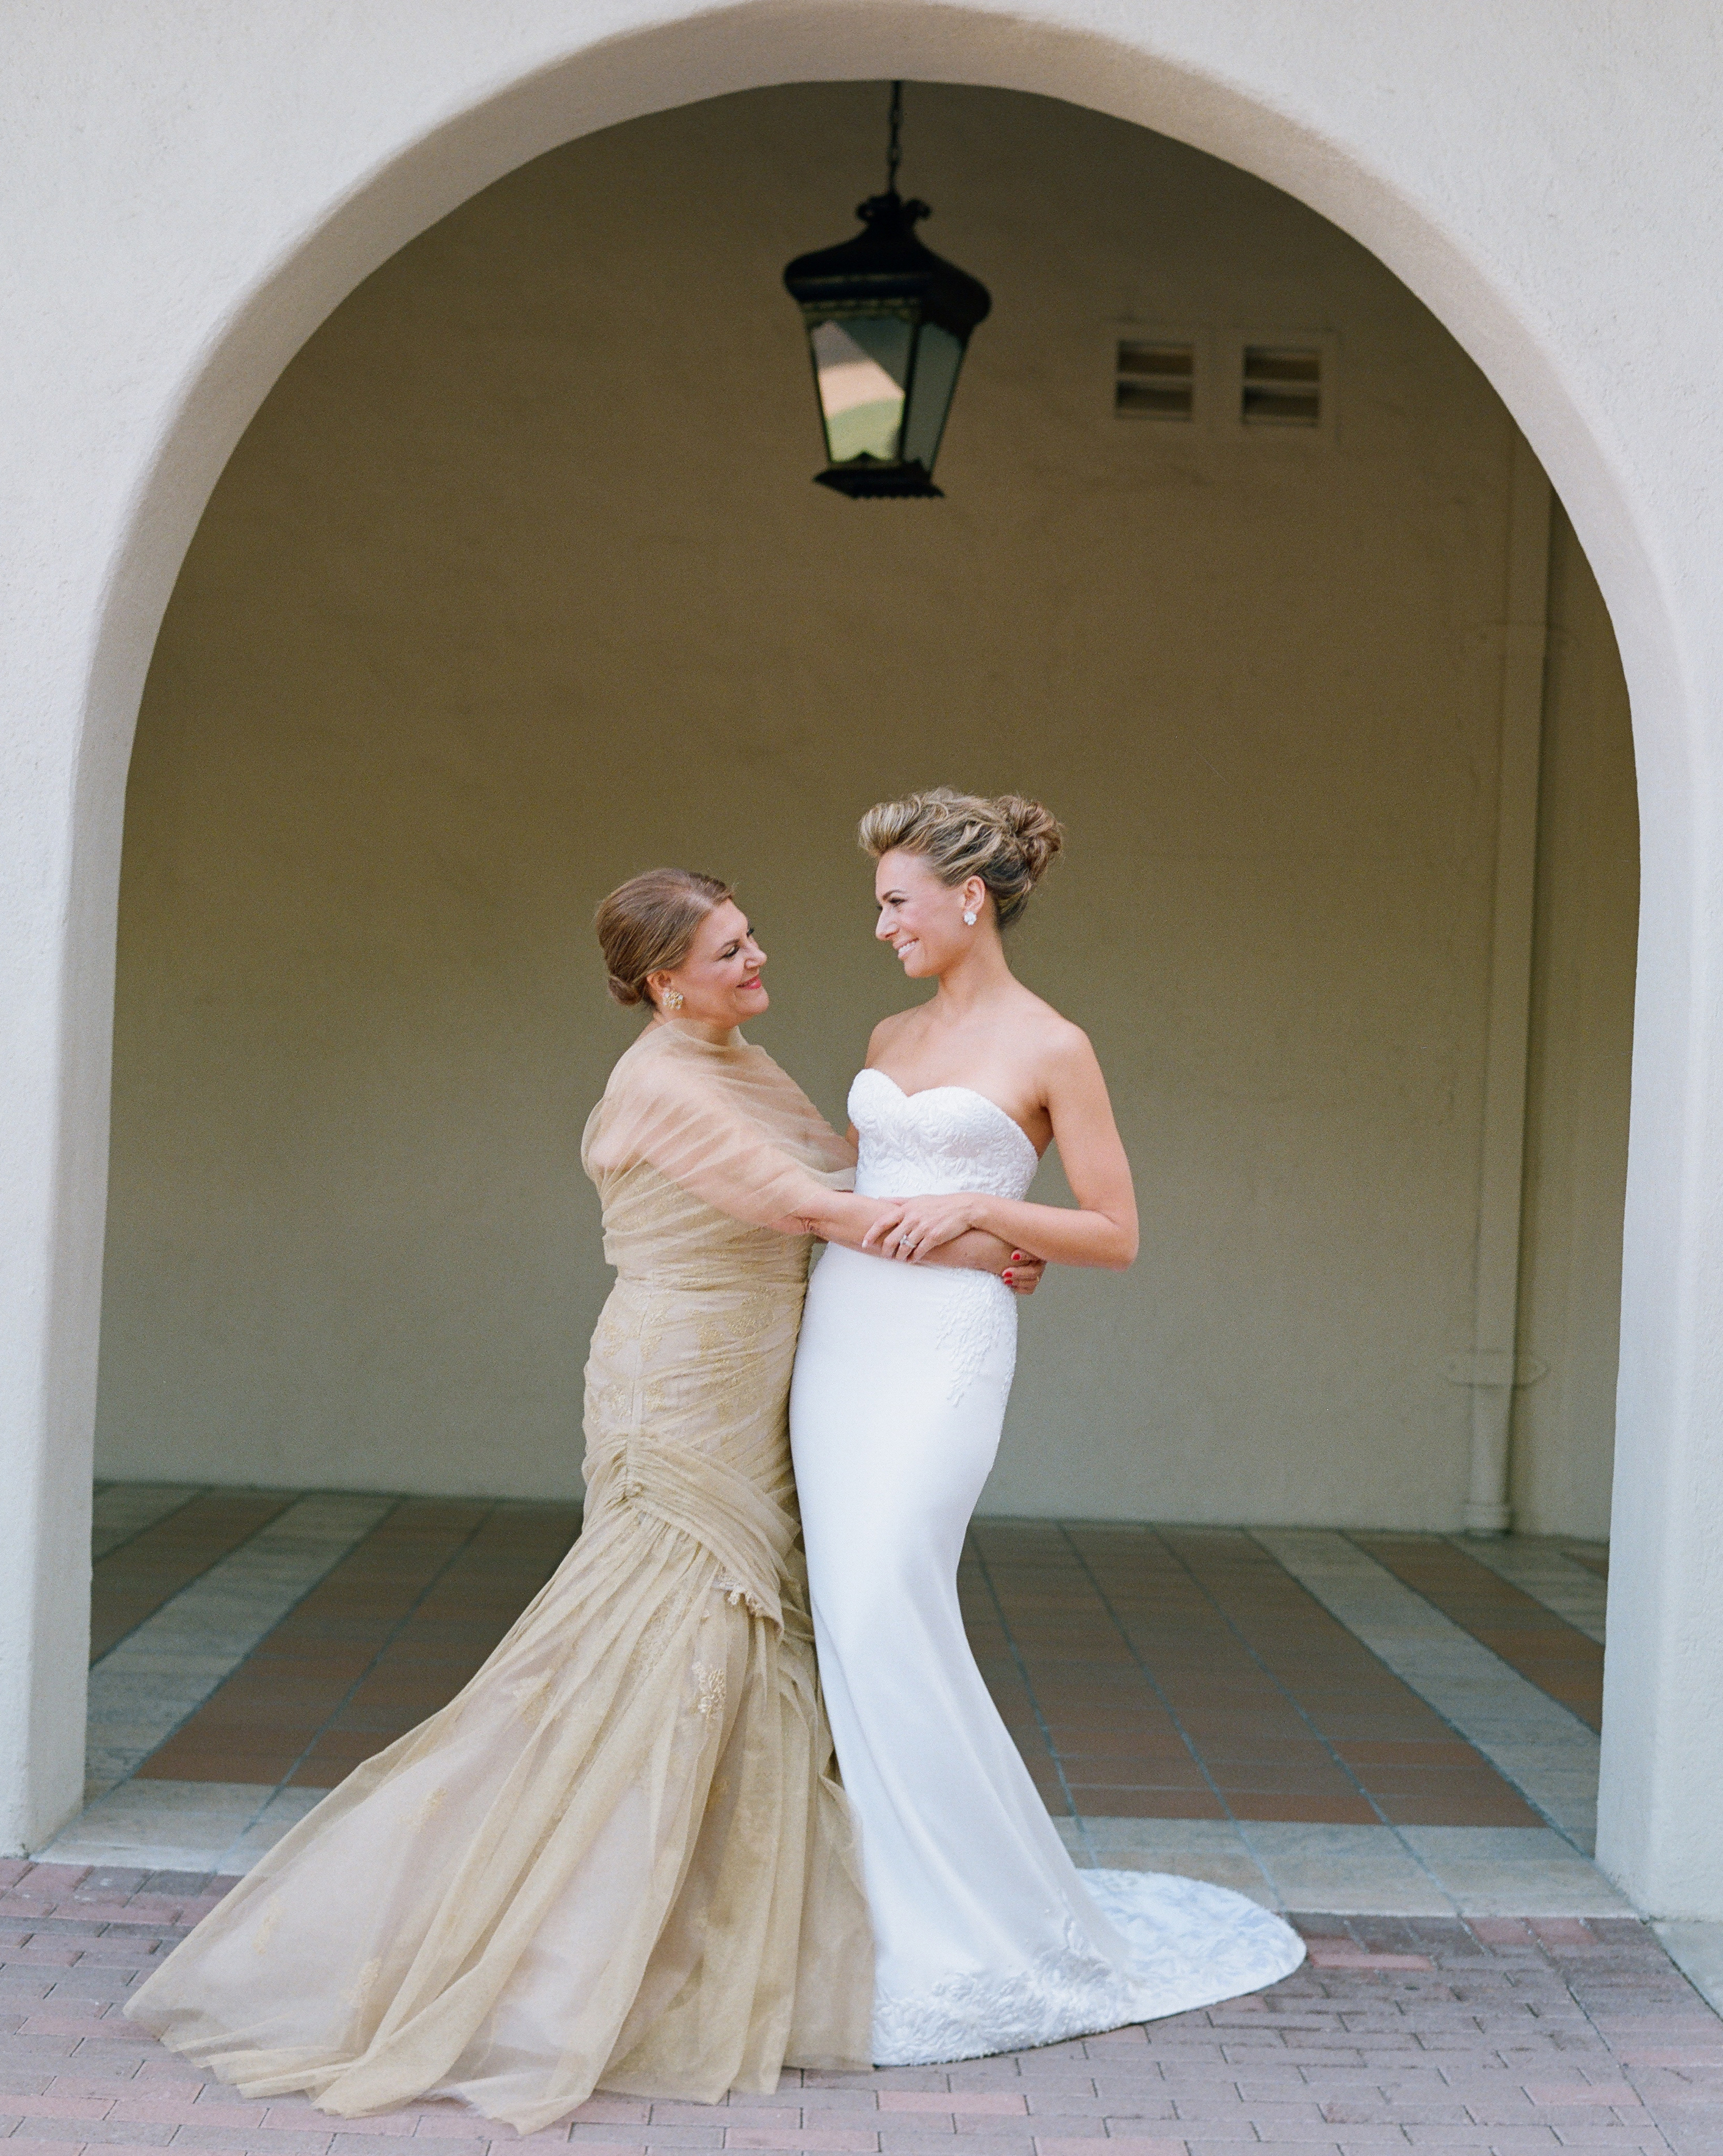 real-wedding-fall14-jojo-eric-174elizabeth-messina-ds111226-0814.jpg